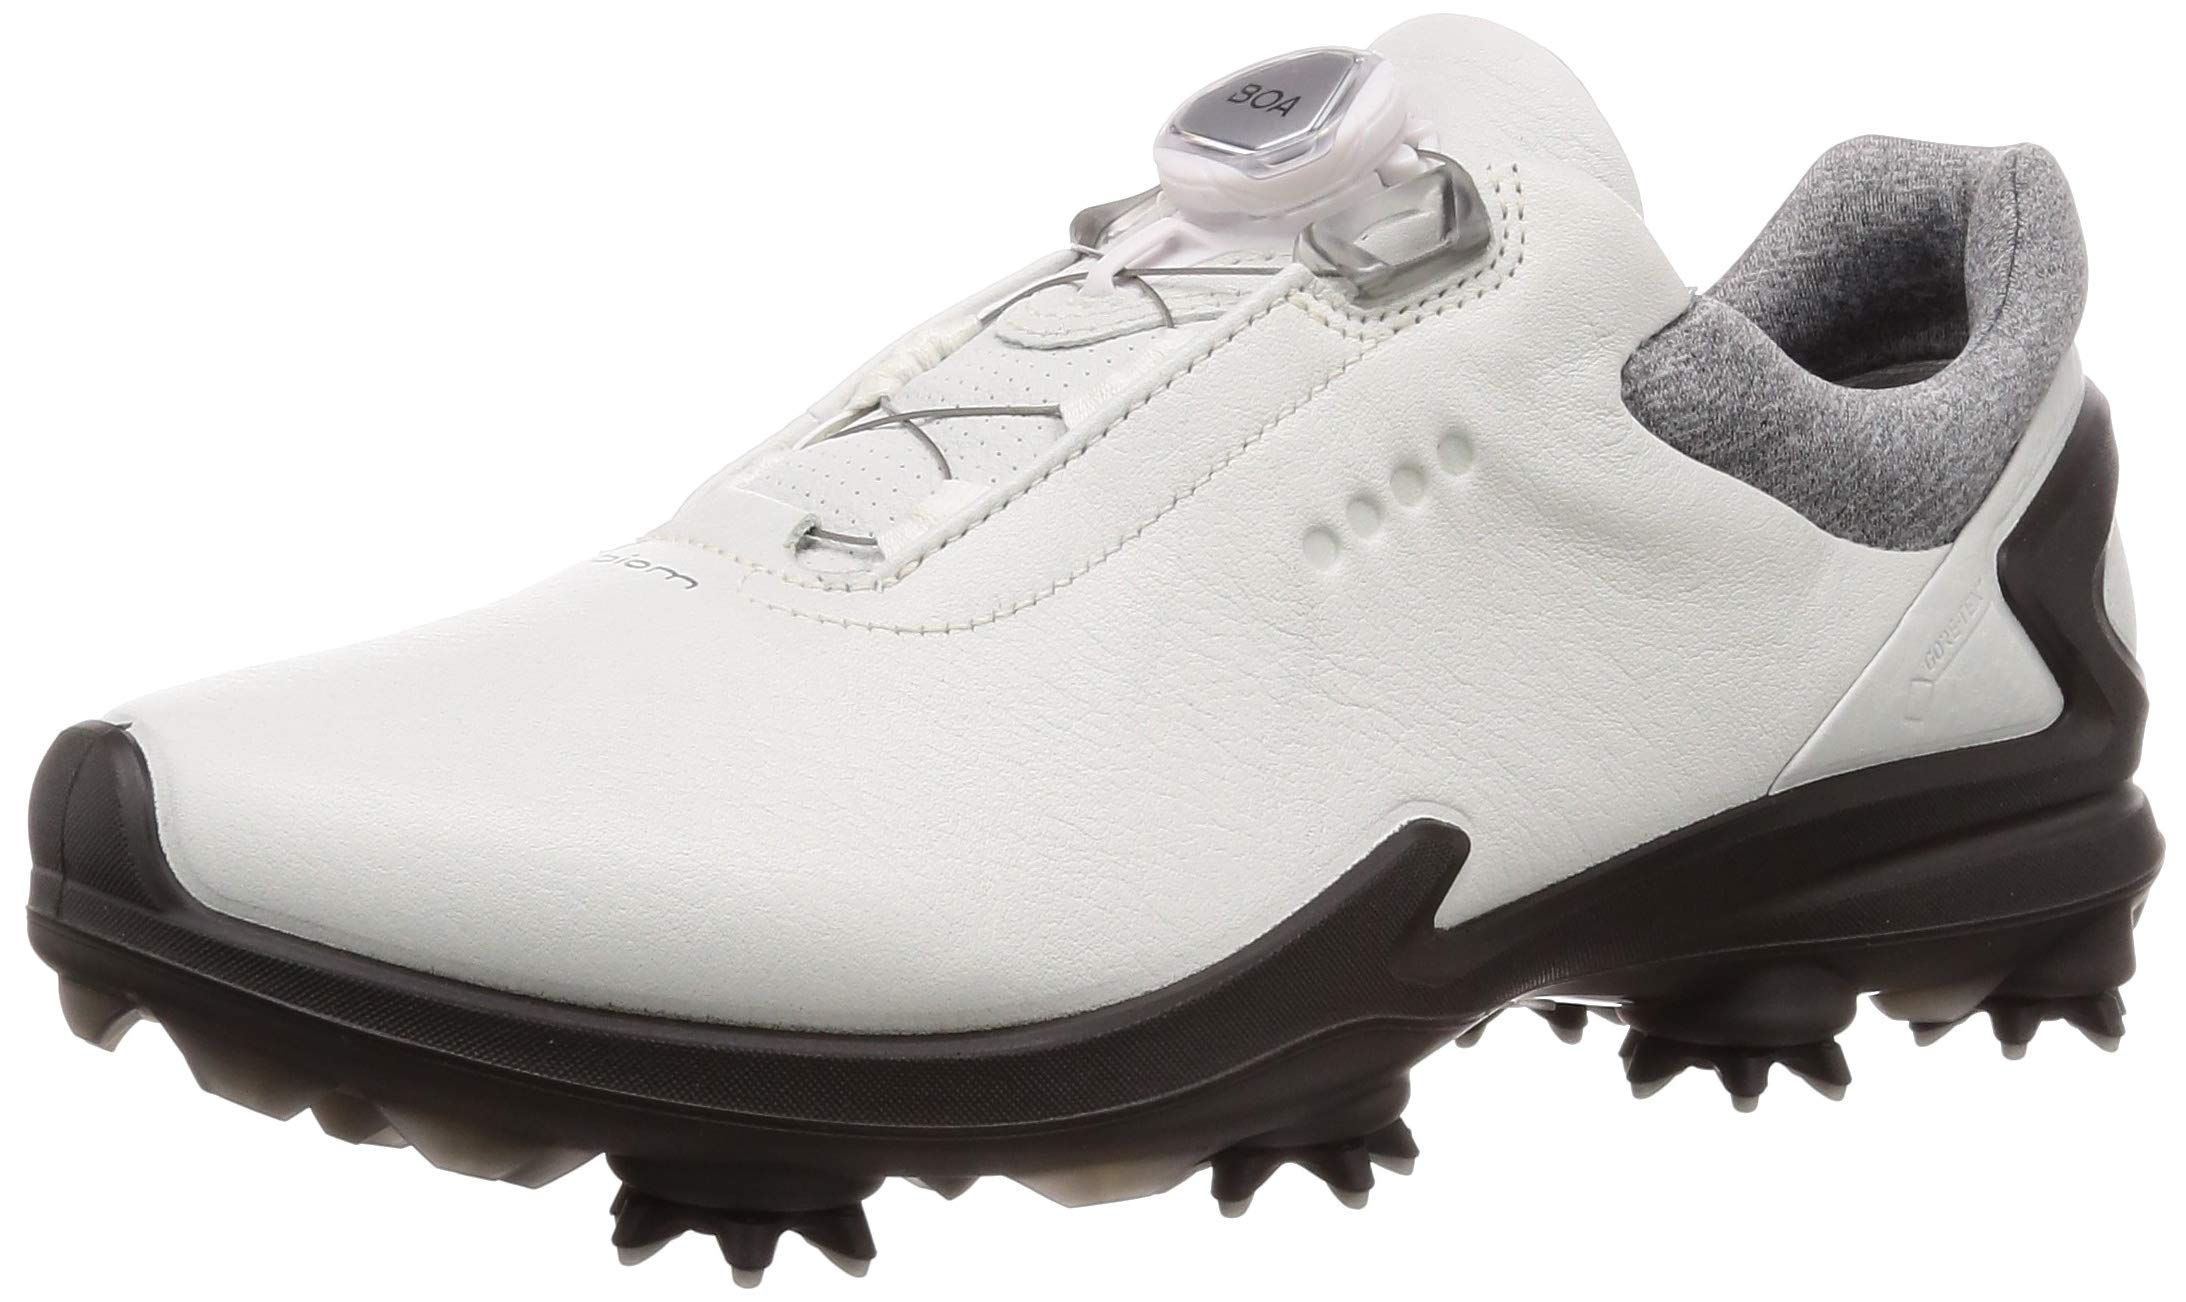 ECCO Men's Biom G3 BOA Gore-TEX Golf Shoe, Shadow White Yak Leather, 10 M US by ECCO